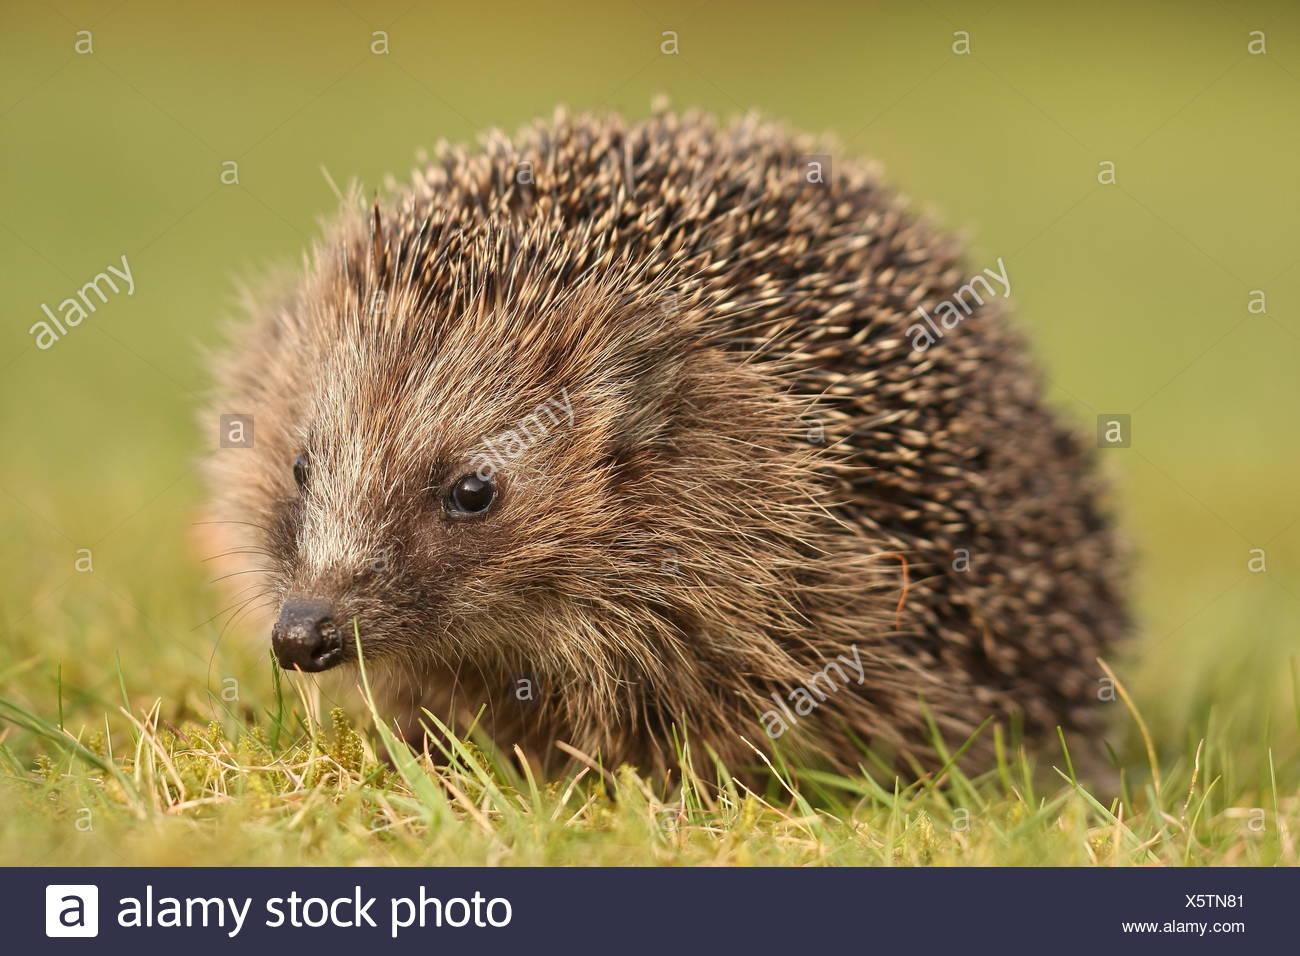 mammal sting hedgehog - Stock Image